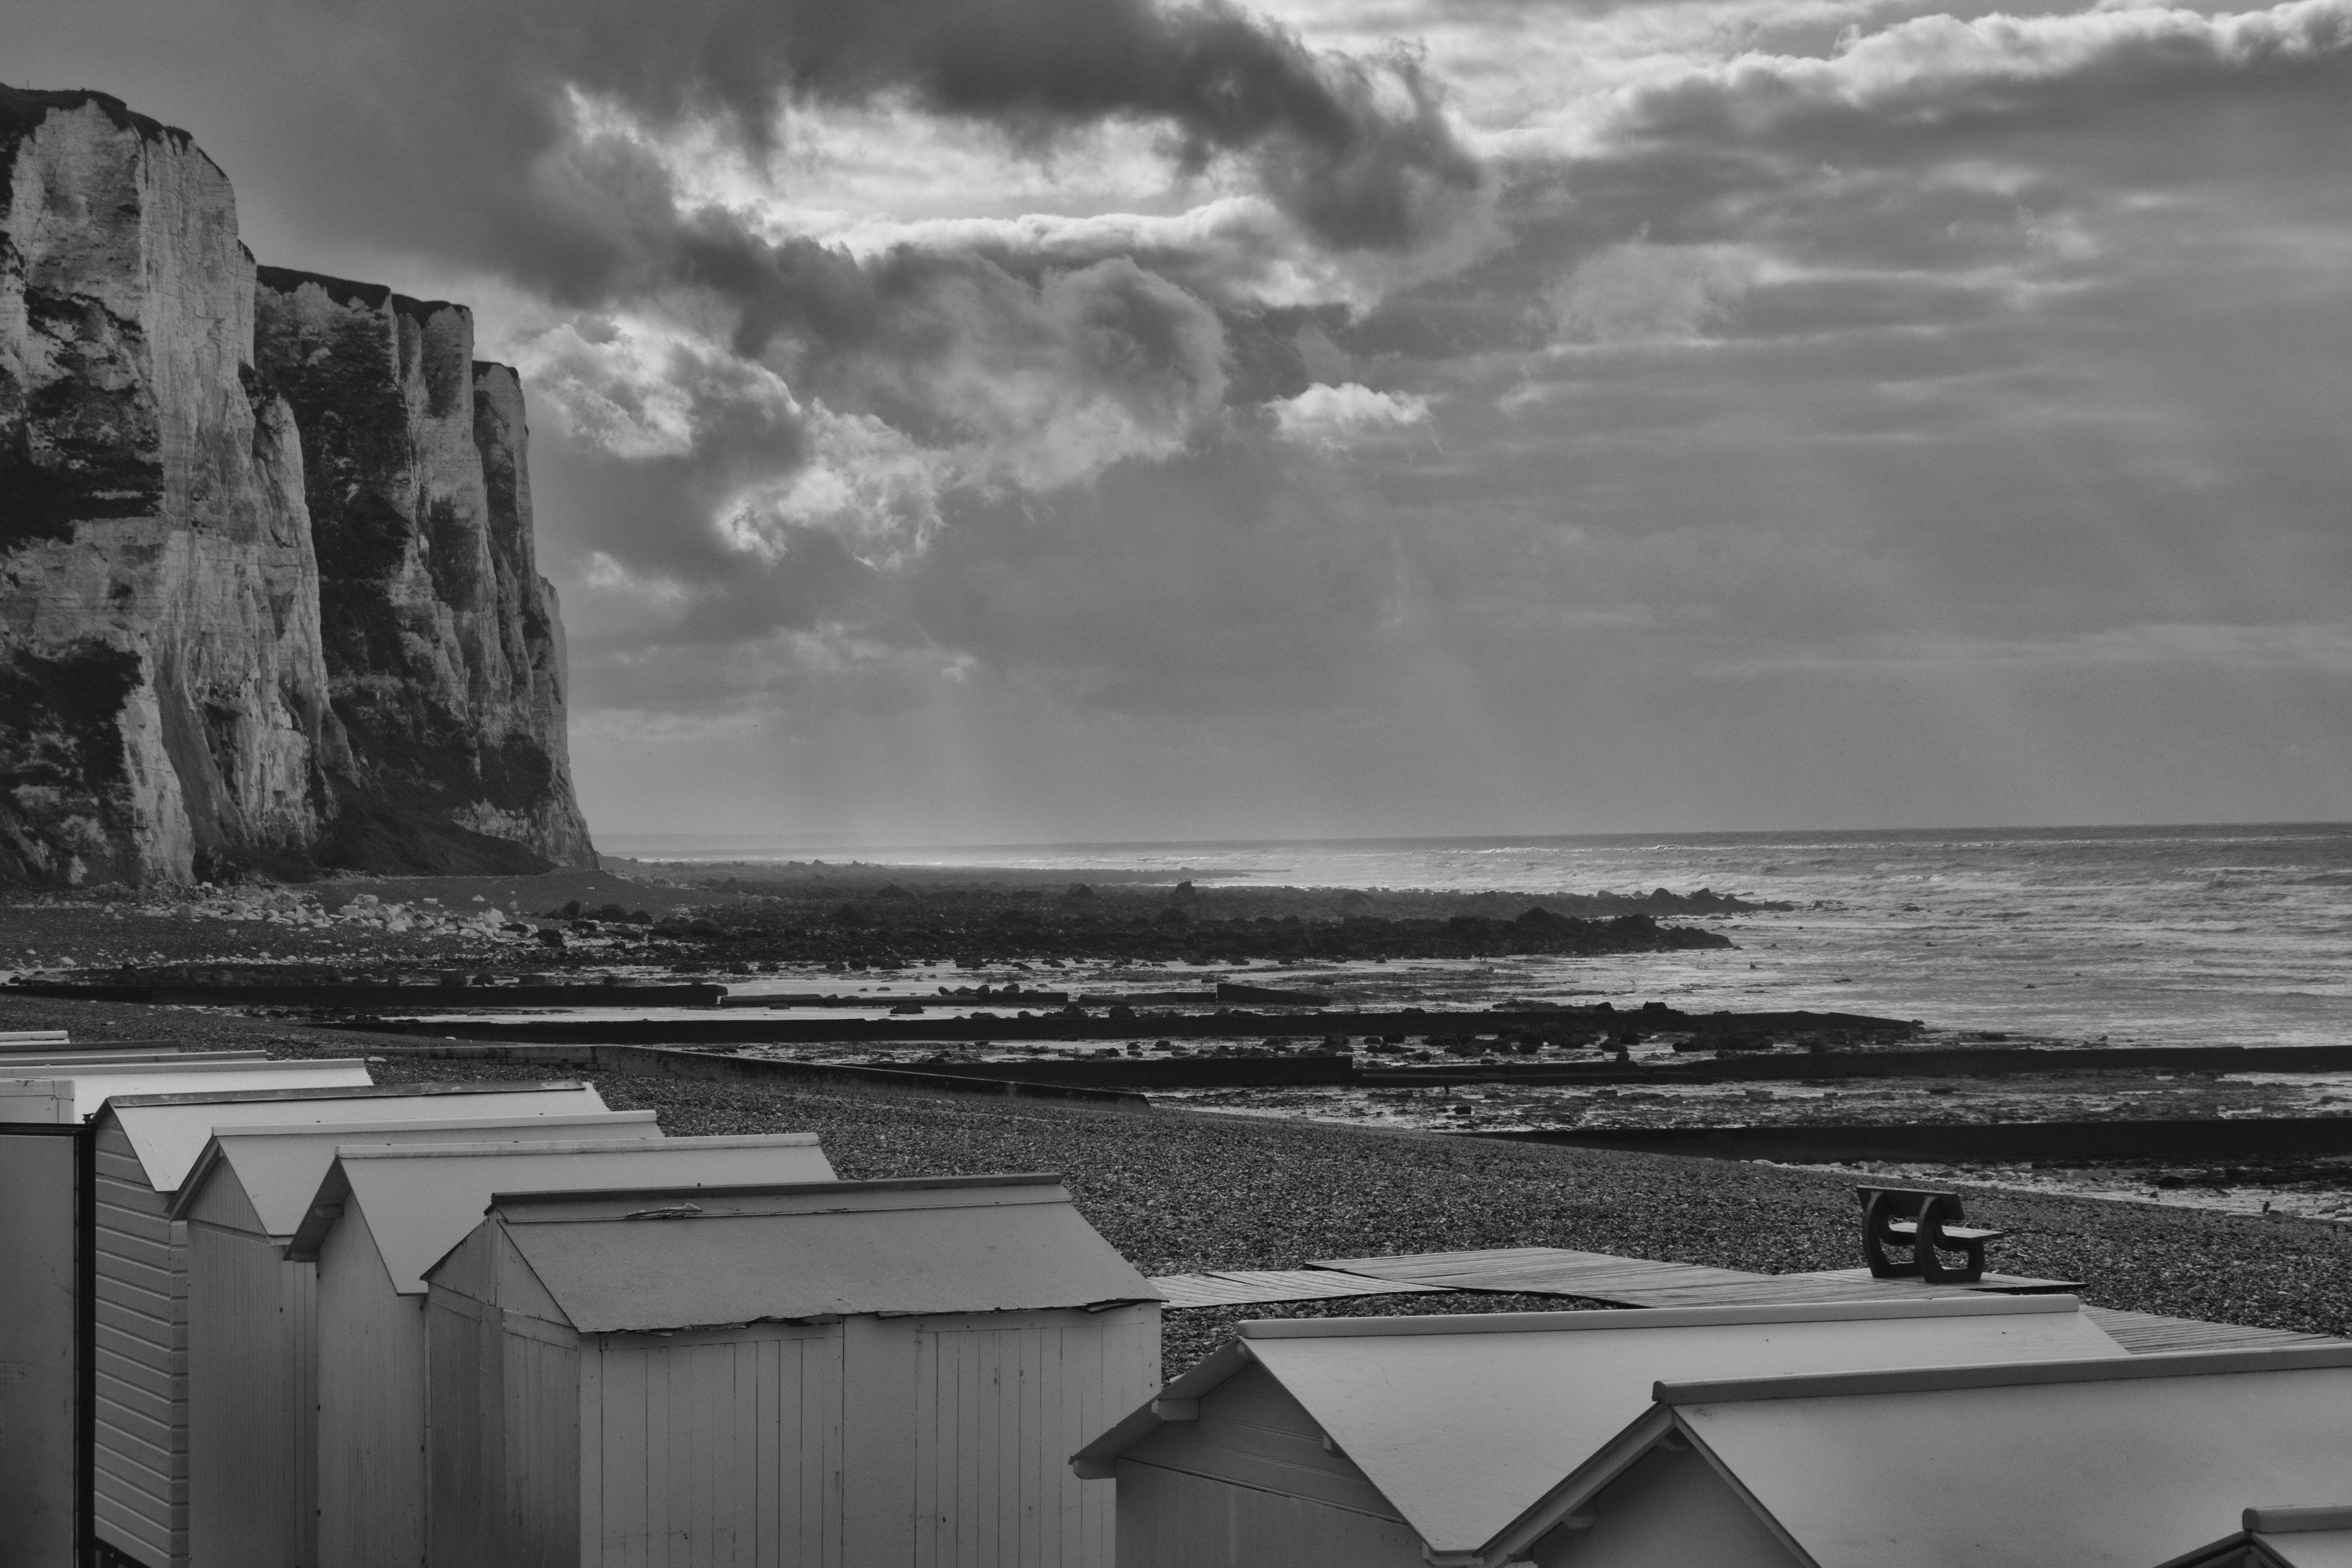 orage-en-mer-photo-noir-et-blanc